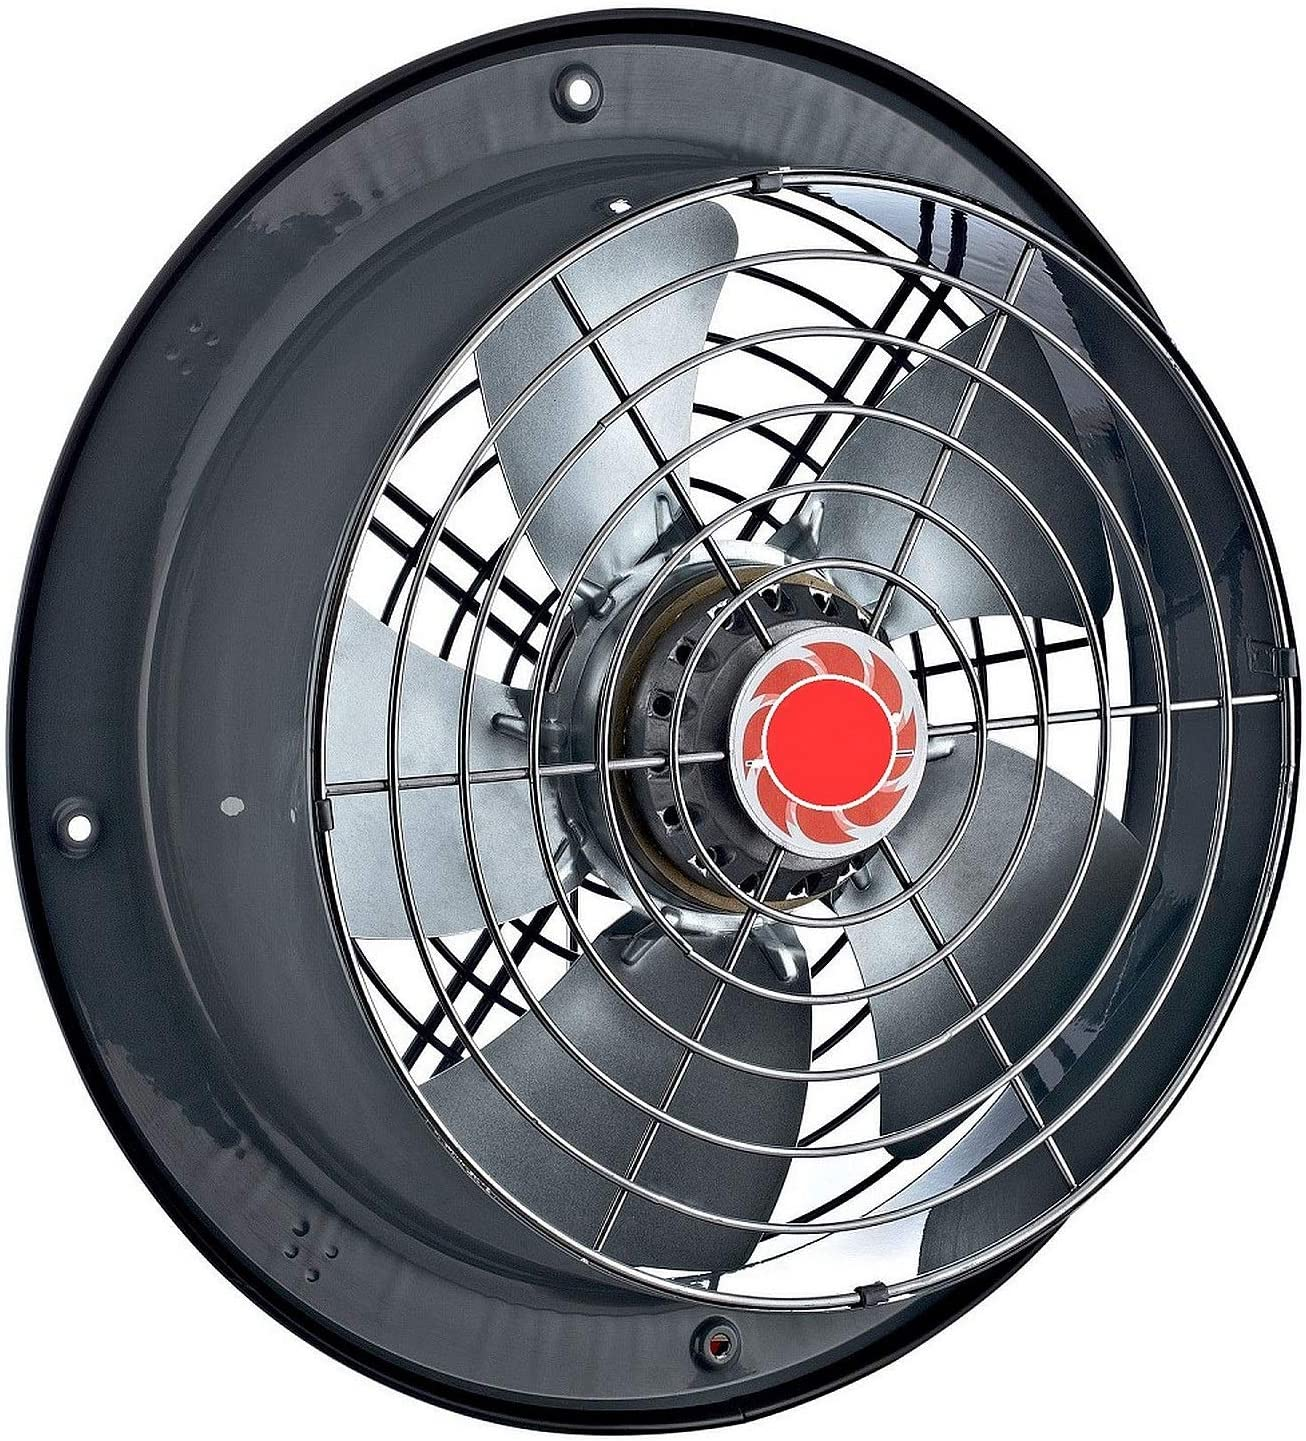 BDRAX 200 Industrial Axial Axiales Ventilador Ventilación extractor Ventiladores ventilador Fan Fans industriales extractores centrifugos radiales turbina aspiracion